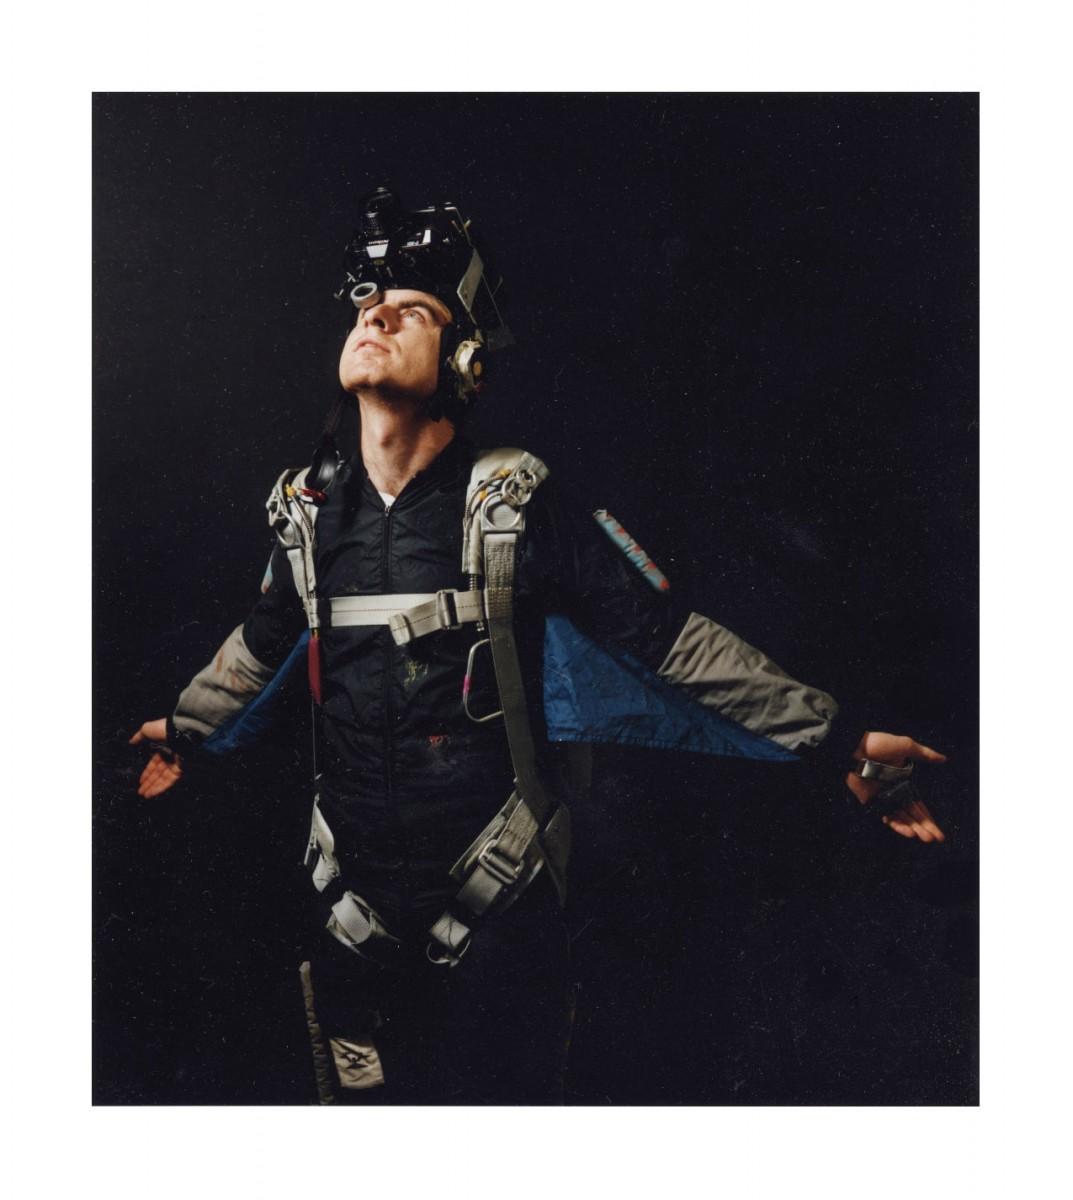 <i>Skydiving Cameraman</i> – Skydiving Cameraman, 1993 <a href='https://paullitherland.com/artsite_wp/wp-content/uploads/PaulLitherland_1993_015_Souvenirs_skydivercamera-1073x1200.jpg' target='_blank'><img src='https://paullitherland.com/artsite_wp/wp-content/themes/artpress-child/img/artworkDownloadImg.png' title='télécharger image / download image' /></a>